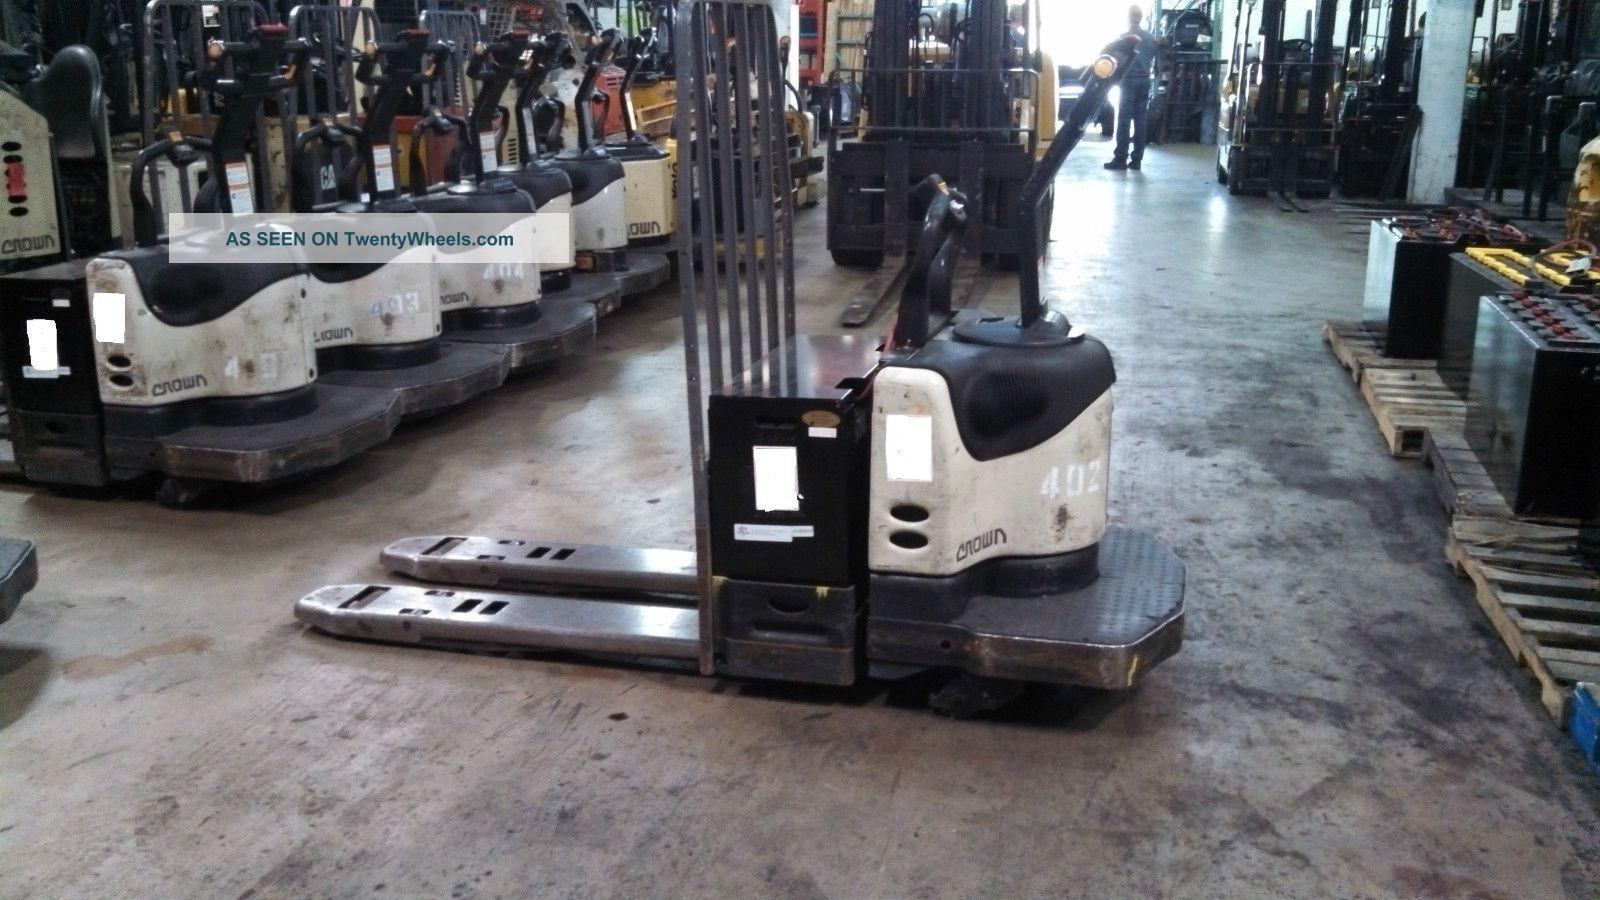 Crown Pallet Jack Rider Pallet Jack Pe4000 Forklifts & Other Lifts photo